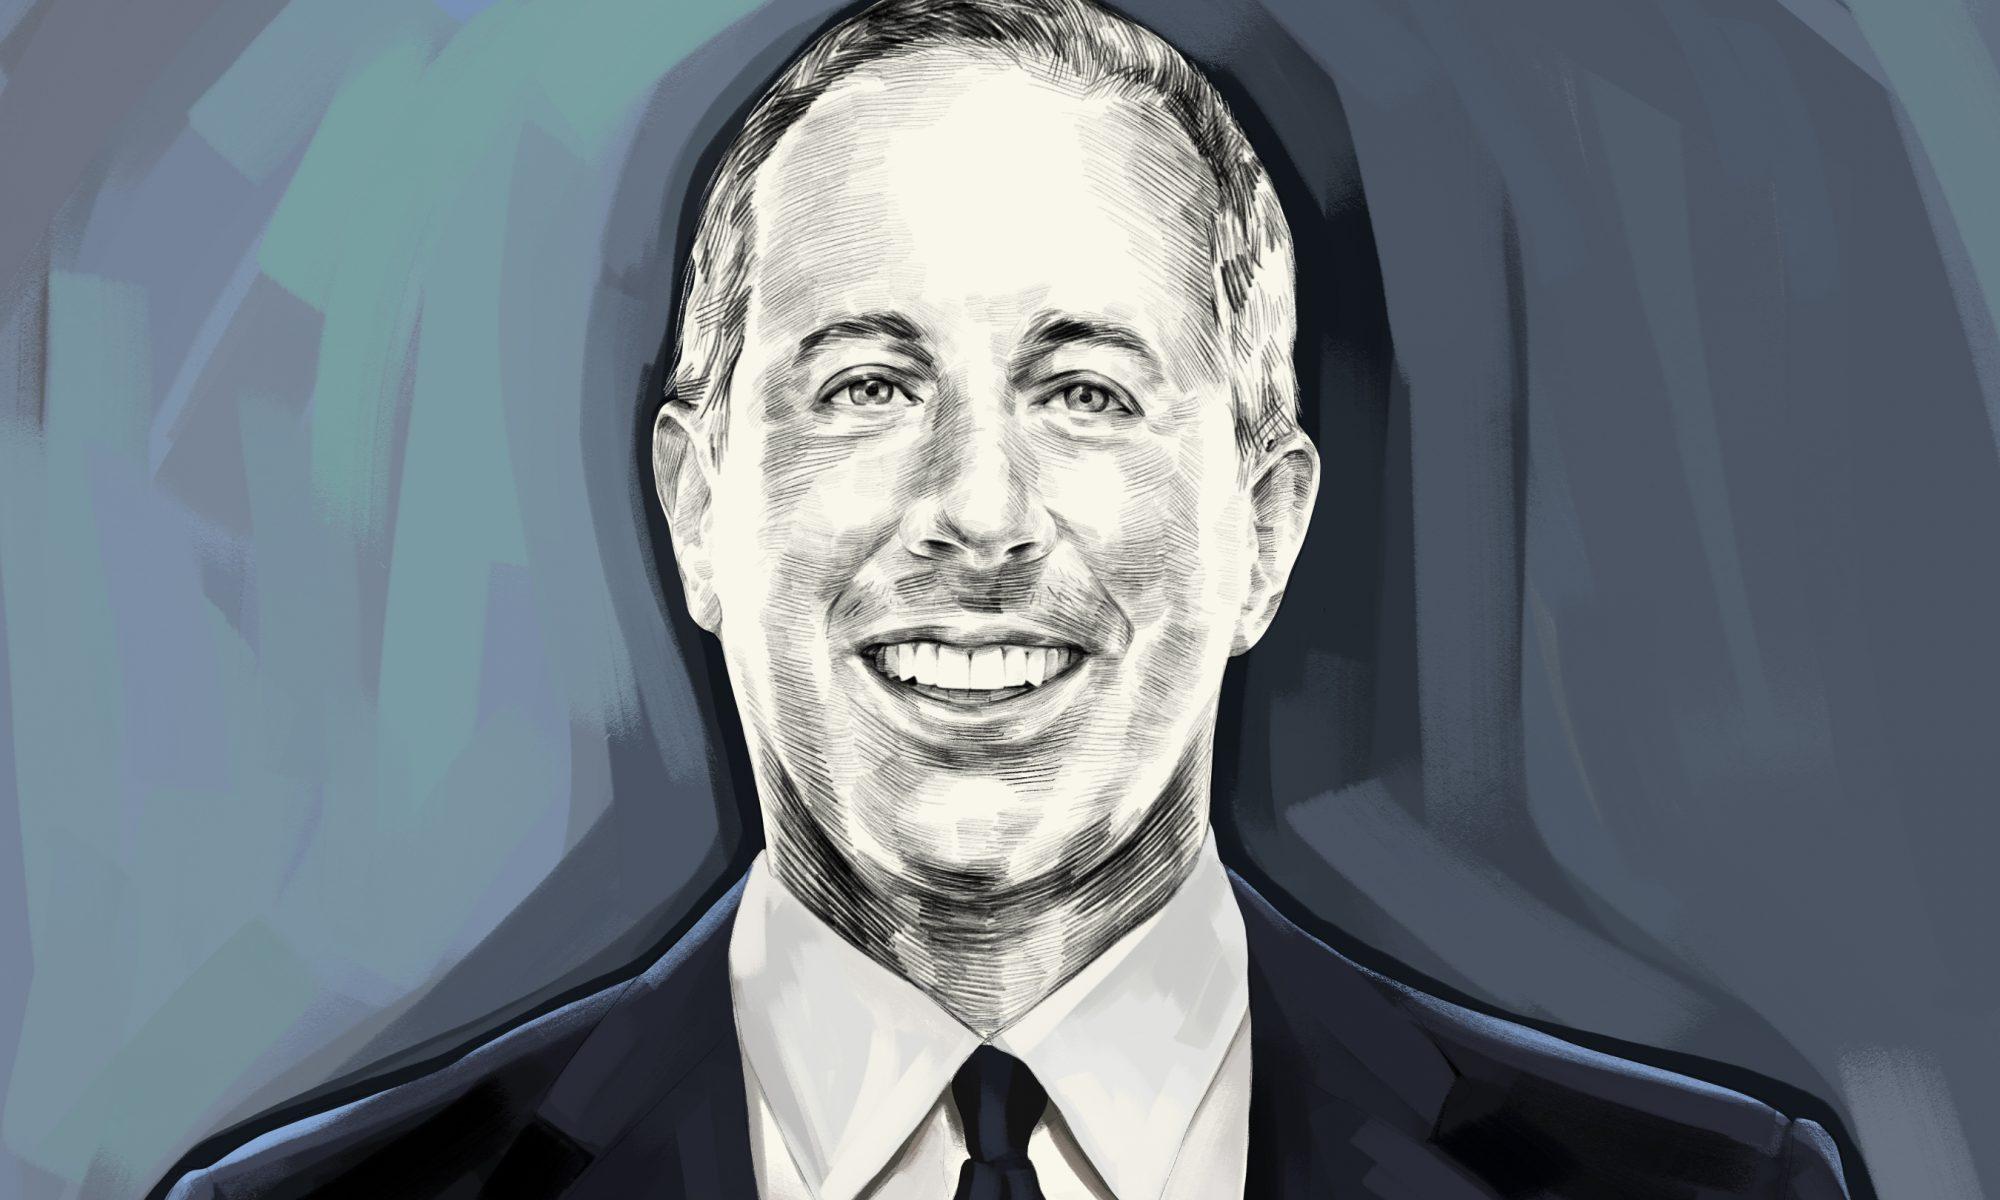 Artist's rendering of Jerry Seinfeld portrait.